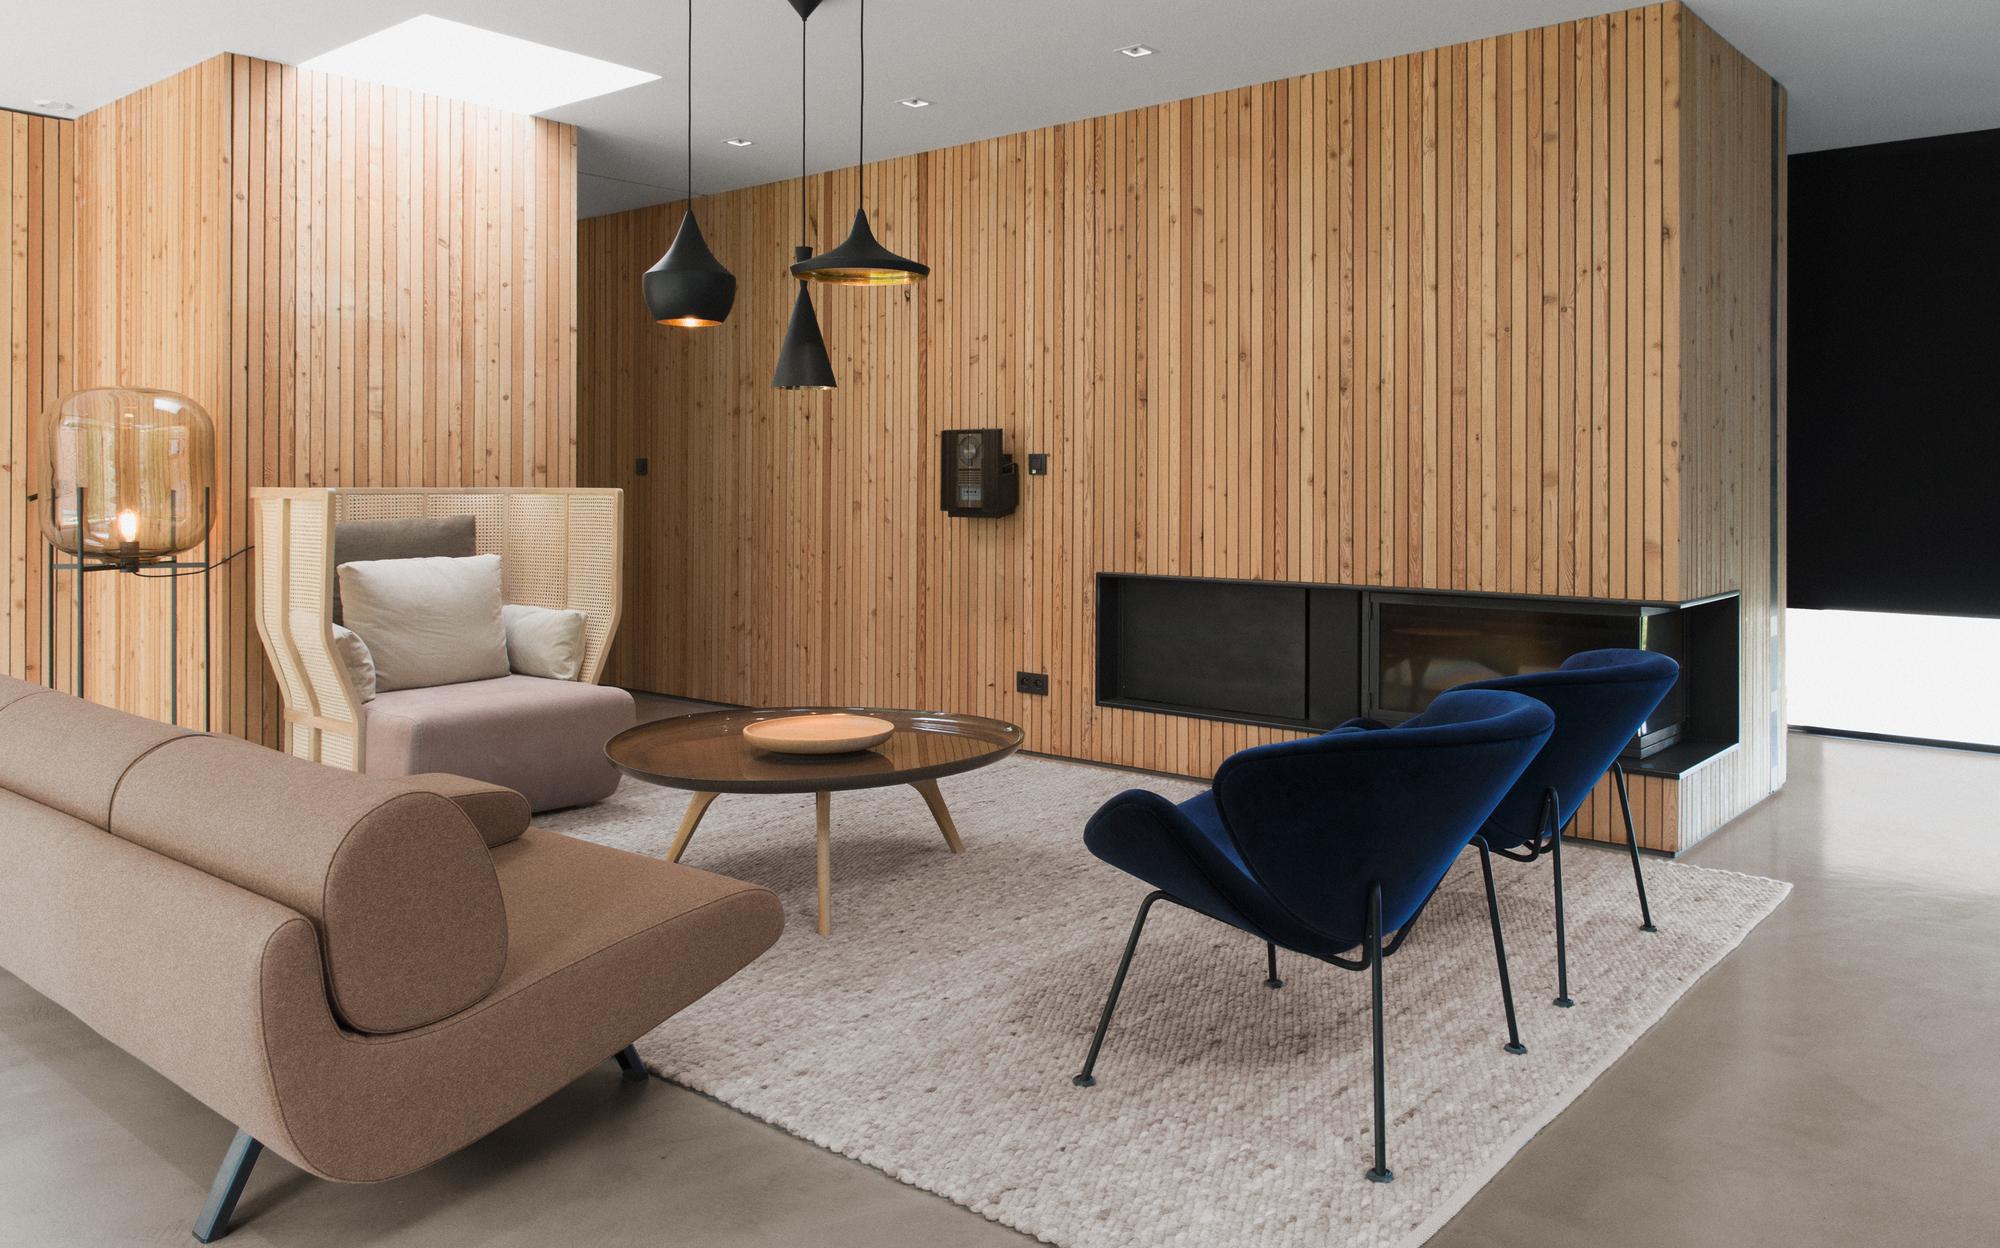 galer a de la maison etir e barres coquet 5. Black Bedroom Furniture Sets. Home Design Ideas